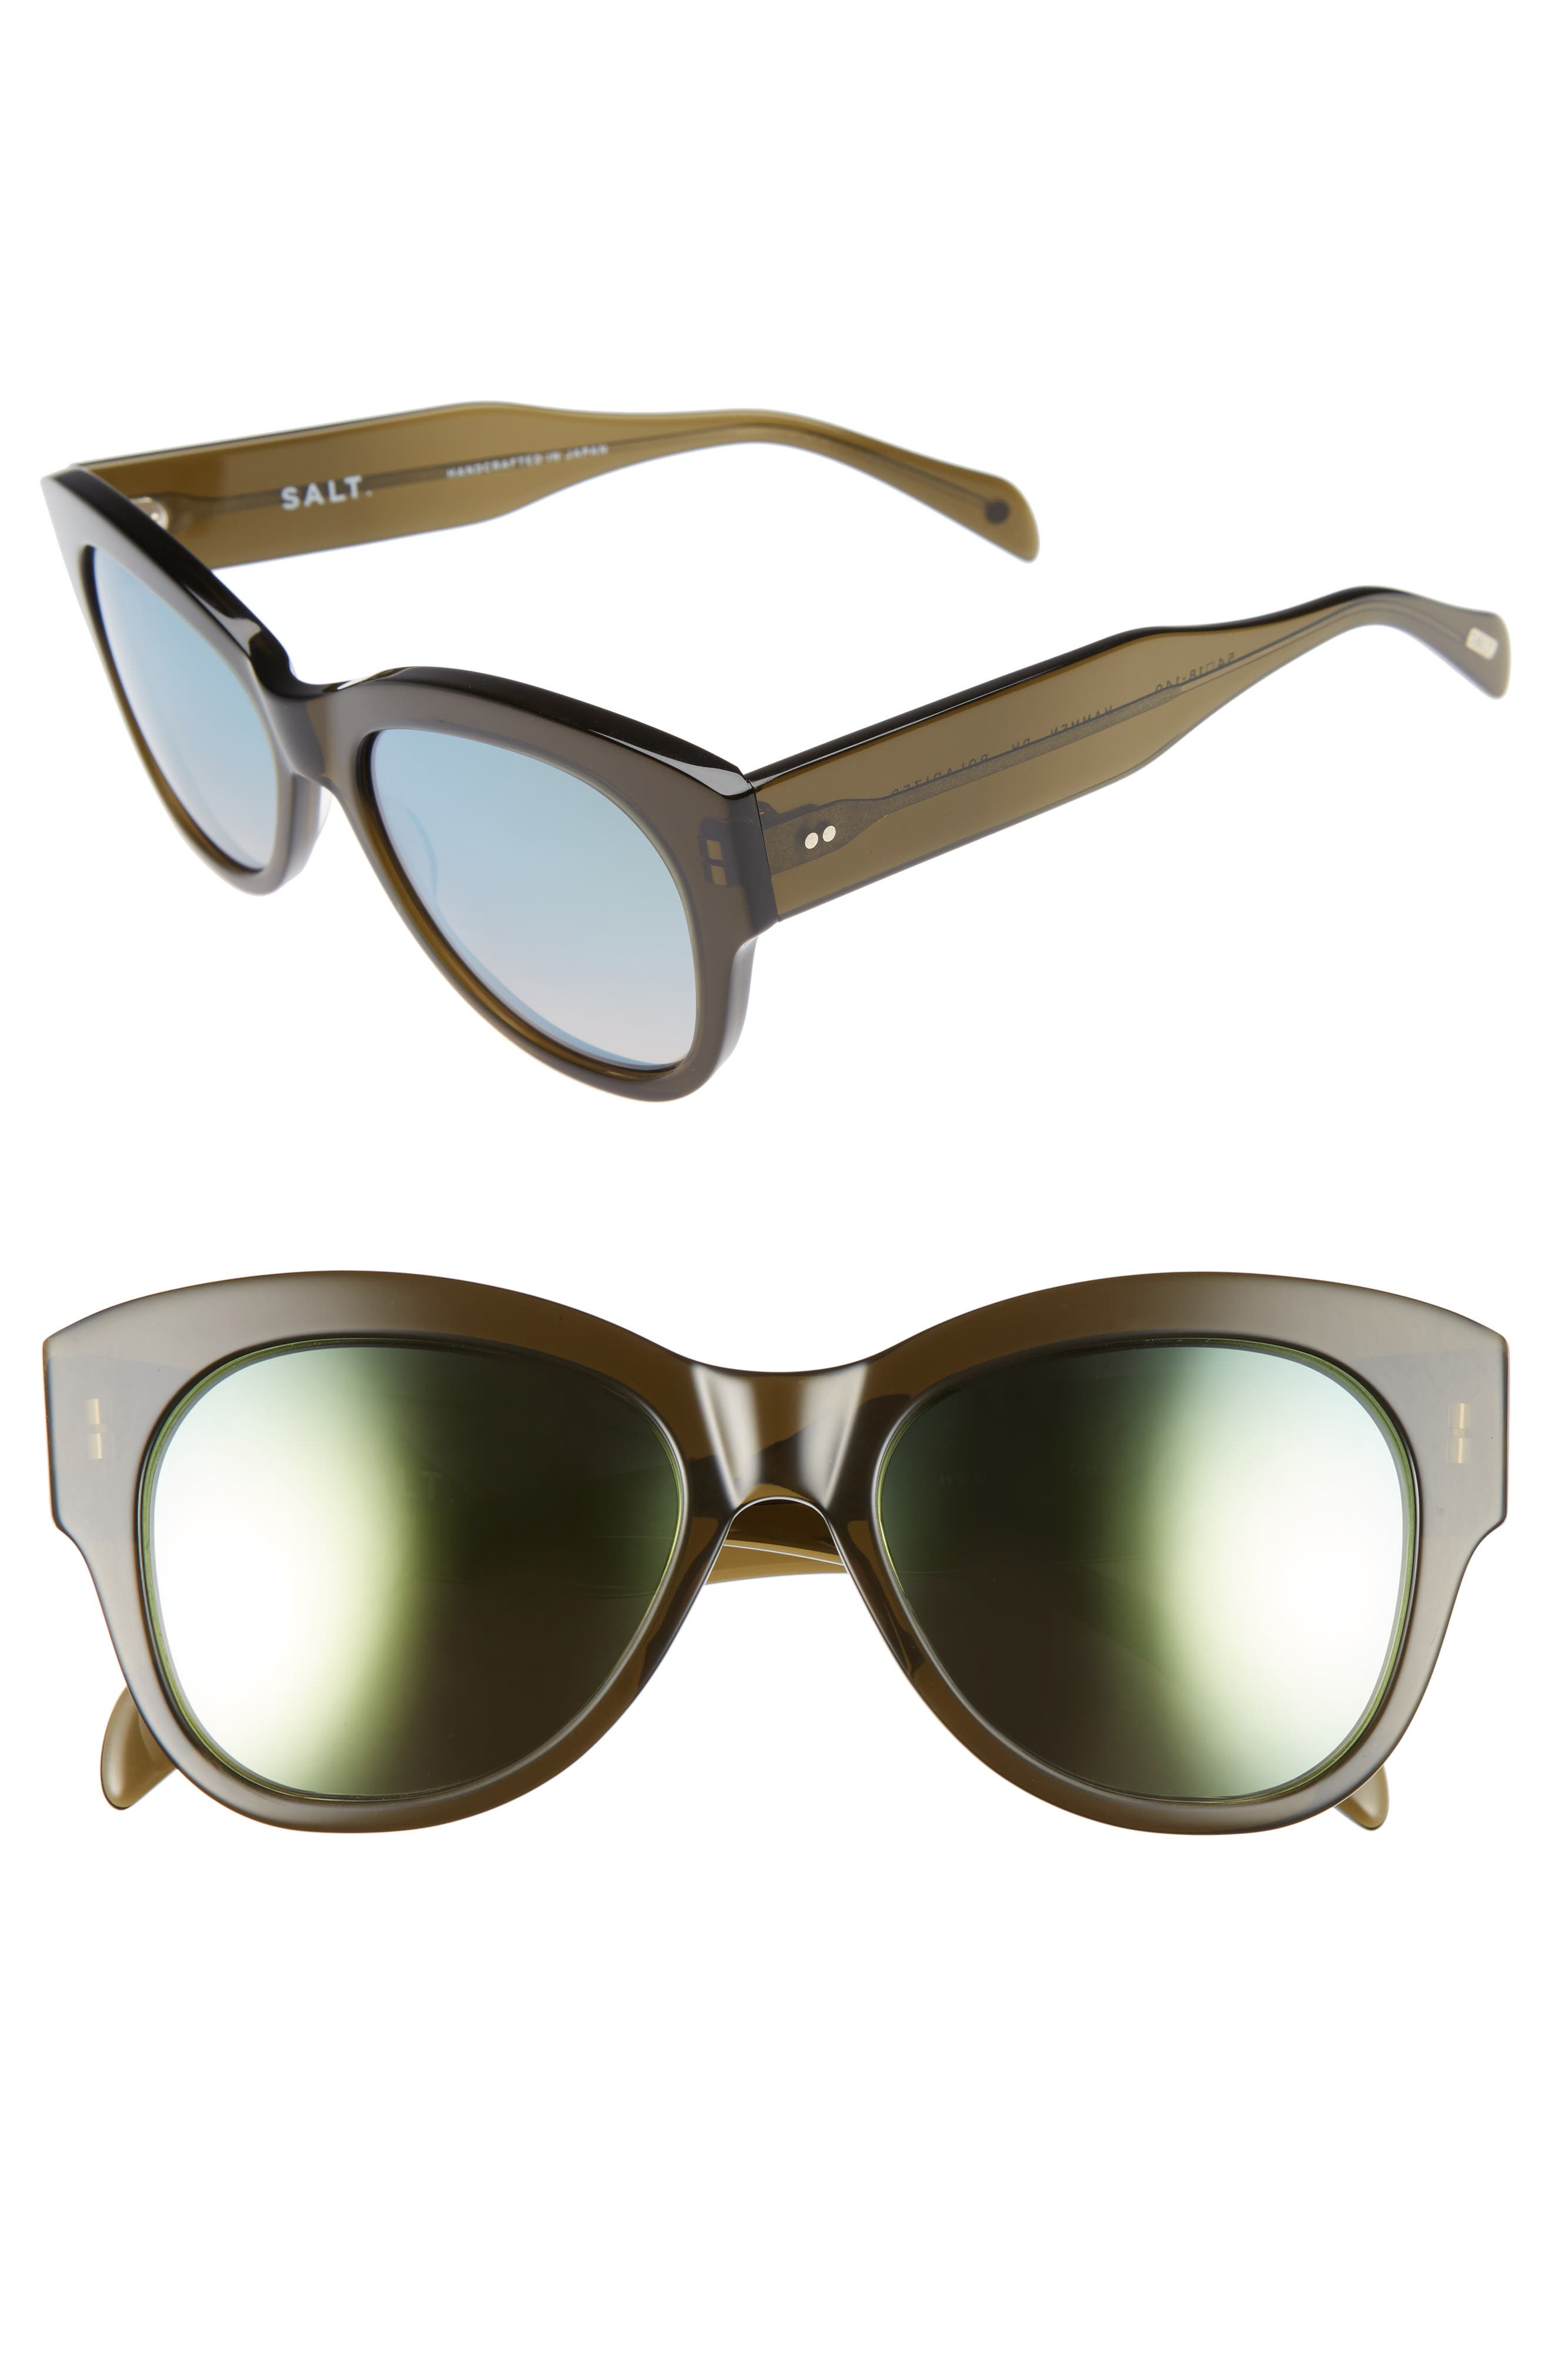 Hammen 54mm Polarized Cat Eye Sunglasses,                             Main thumbnail 1, color,                             DRIED HERB